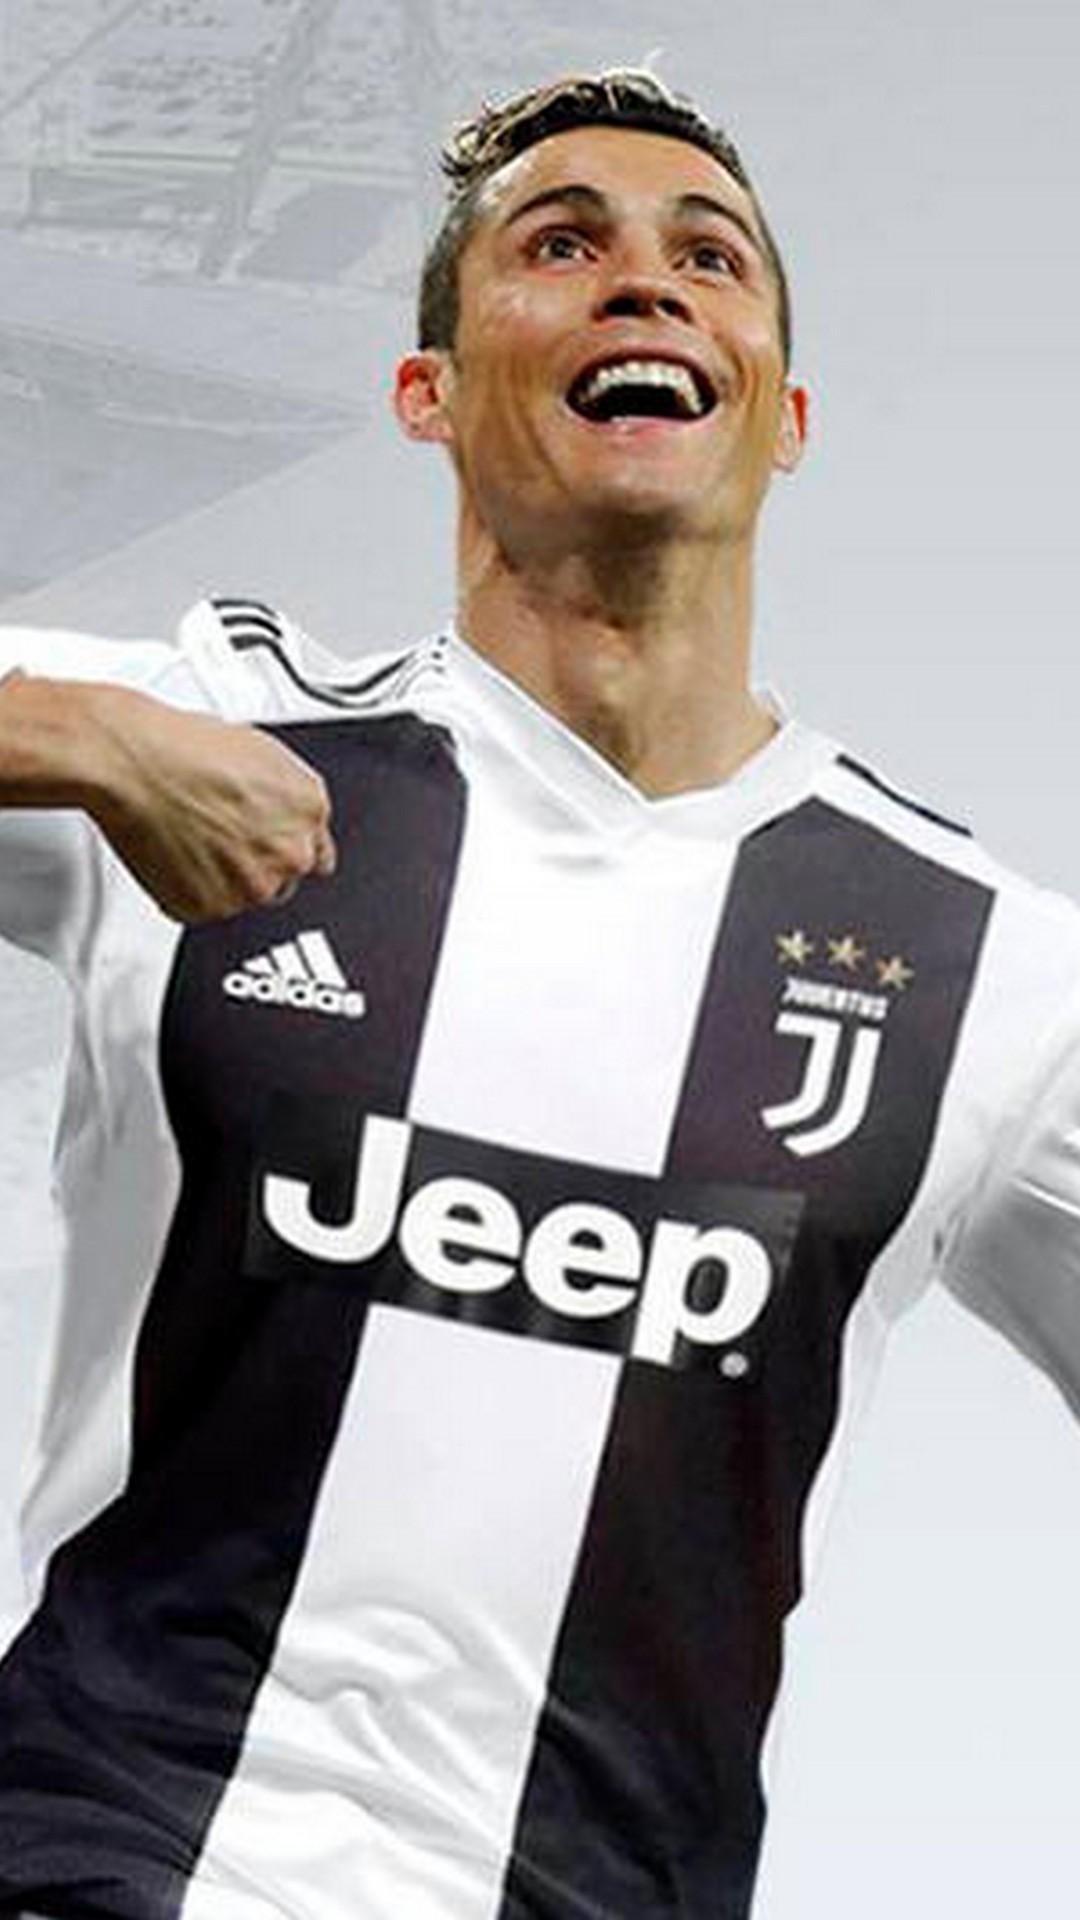 Cristiano Ronaldo Juventus iPhone Wallpaper 2020 3D iPhone Wallpaper 1080x1920